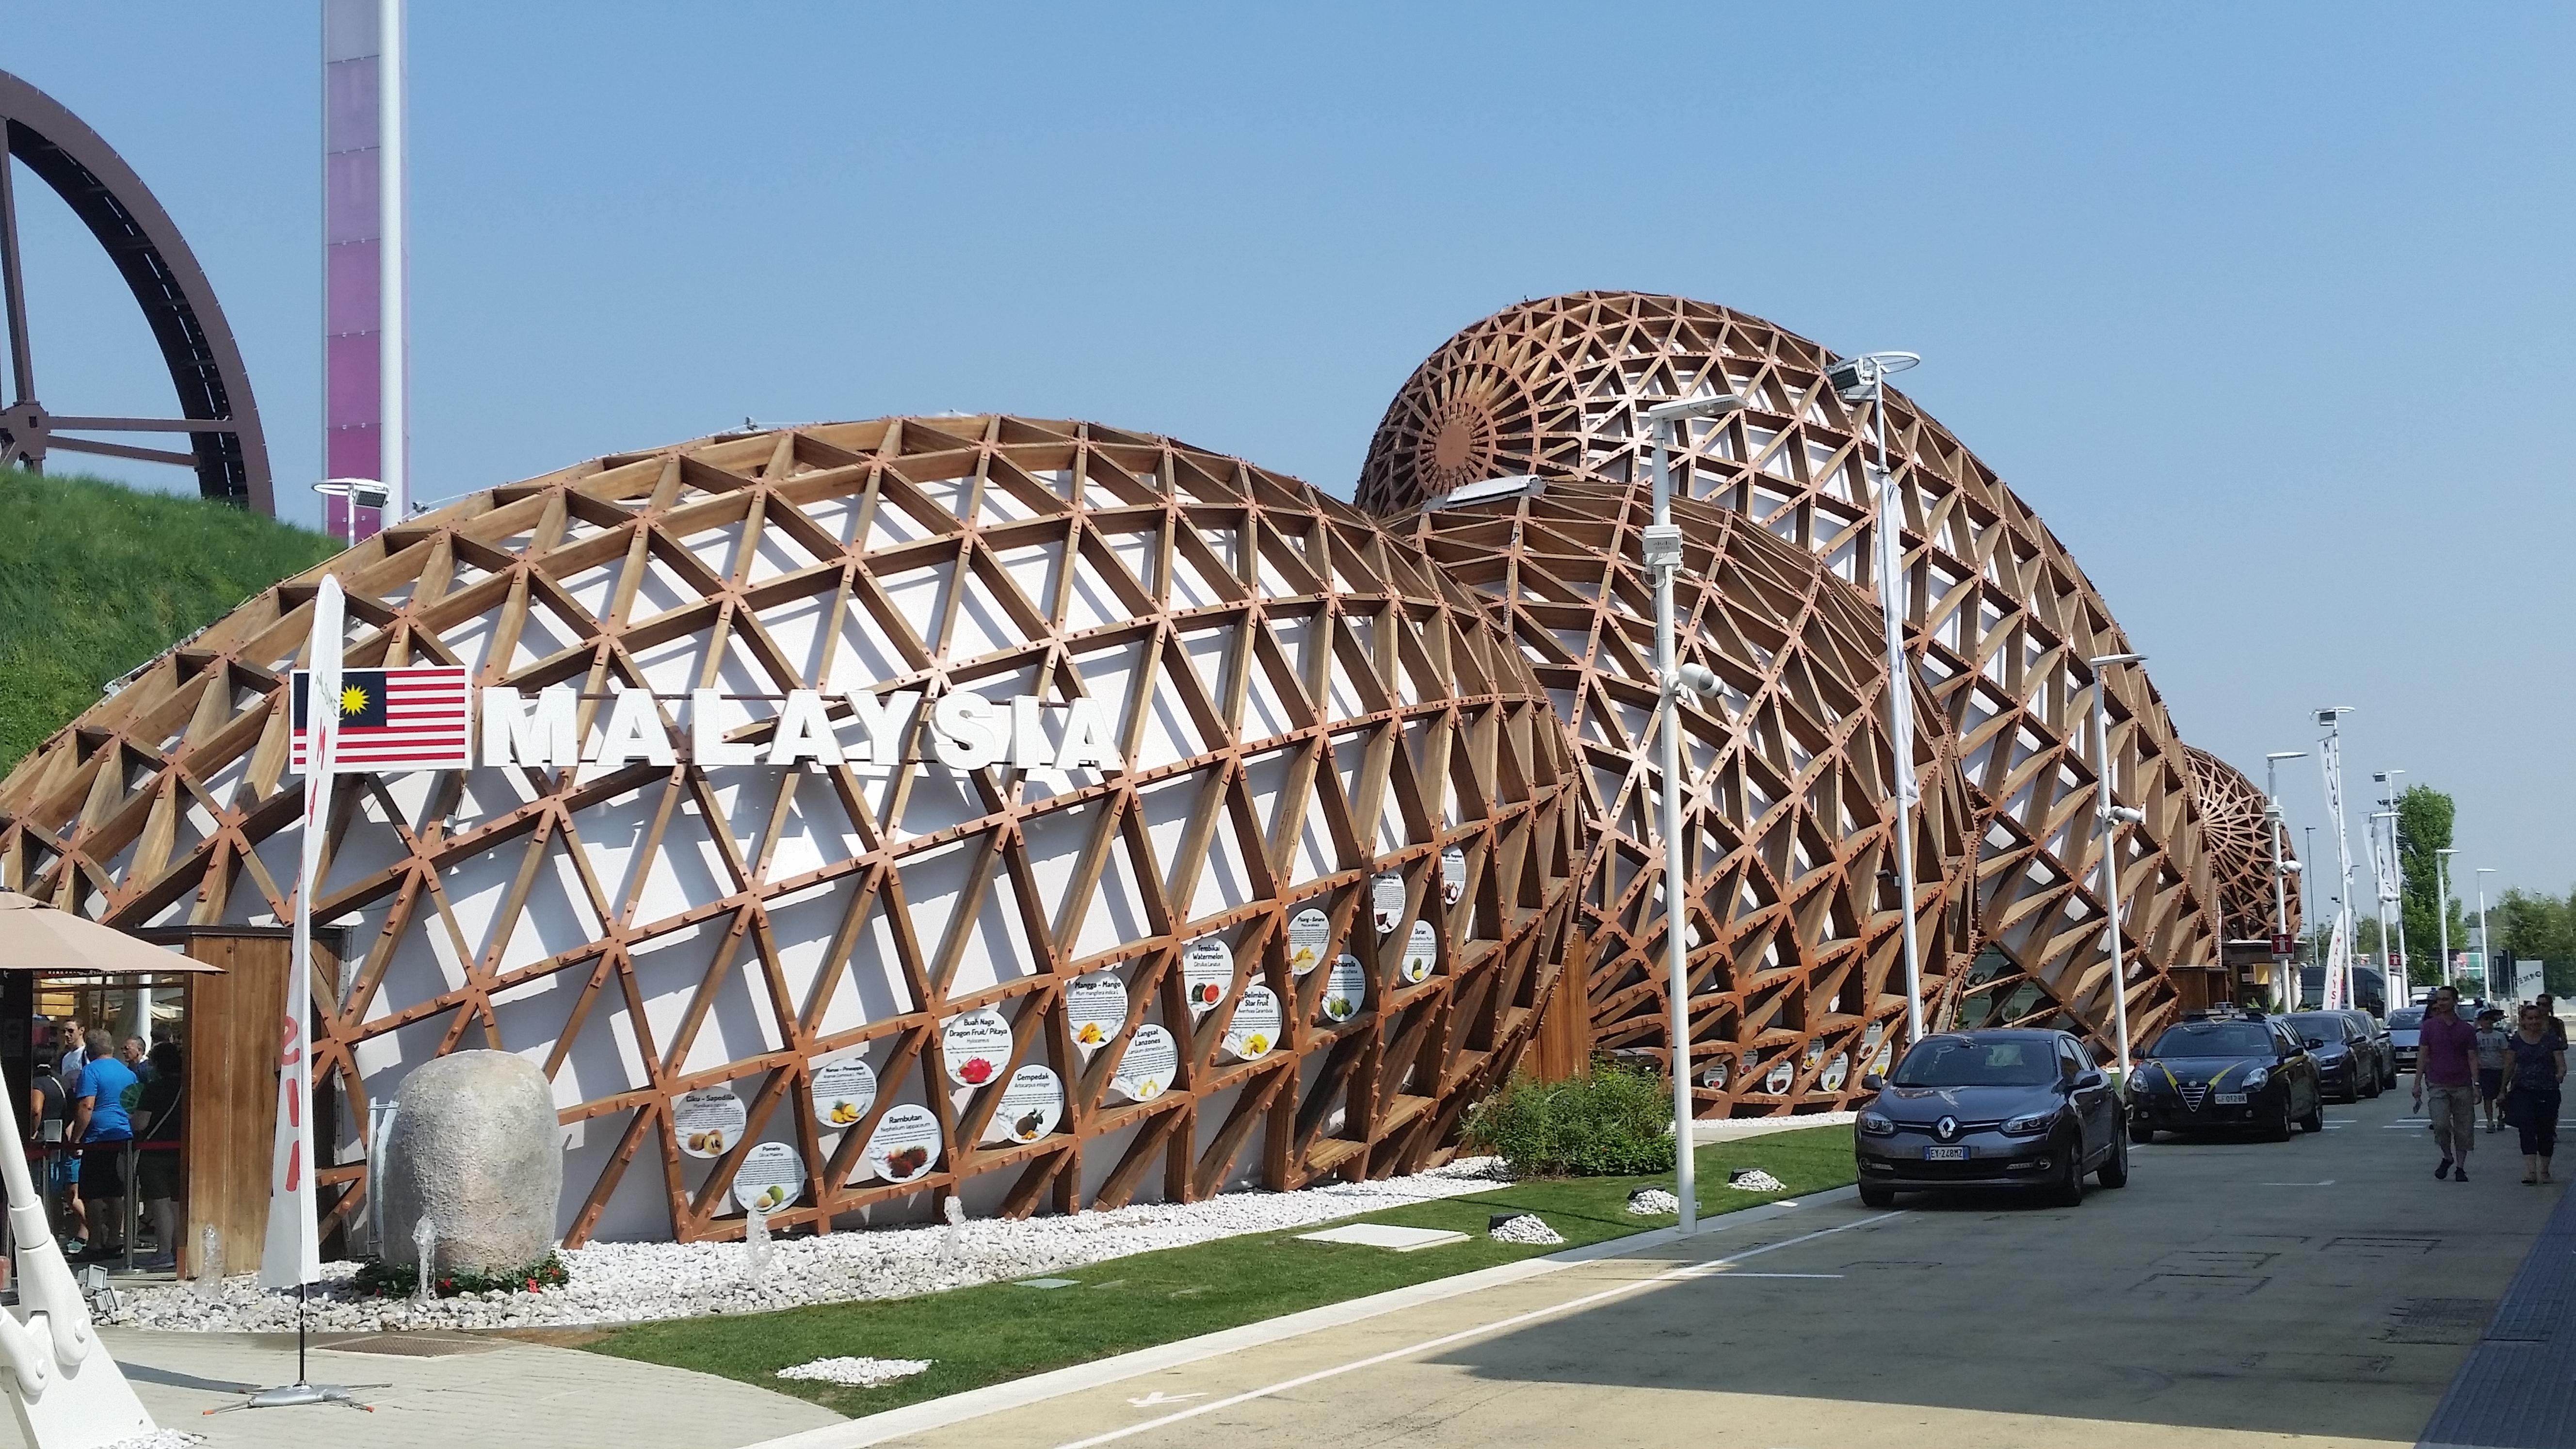 File:Expo Milano 2015 - Pavilion of Malaysia.jpg - Wikimedia Commons